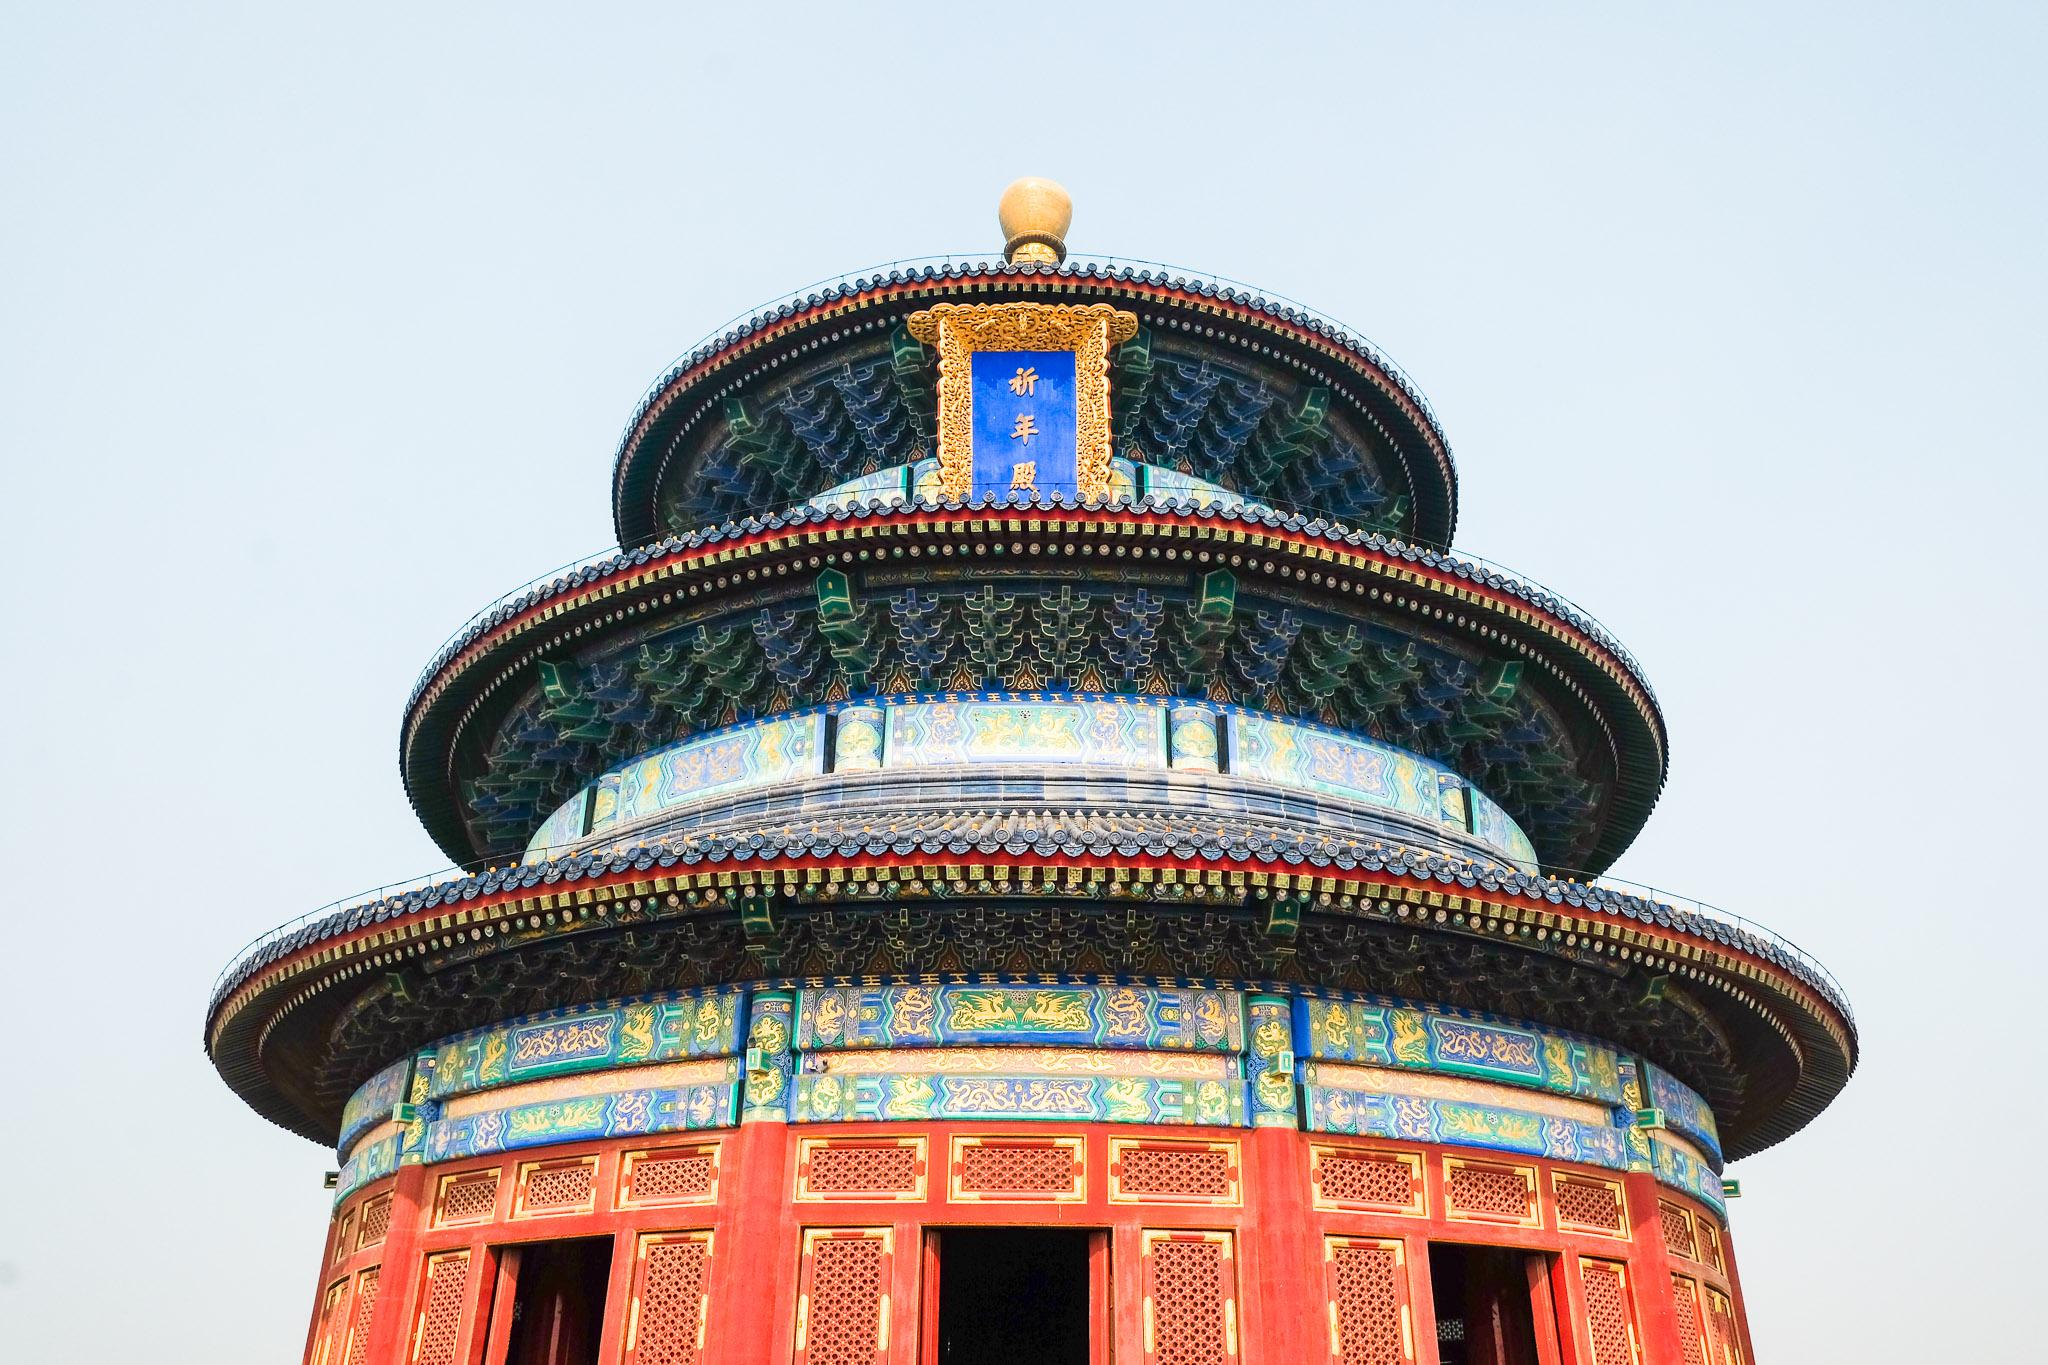 china-beijing-temple-of-heaven-hall-of-good-harvests-1.jpg